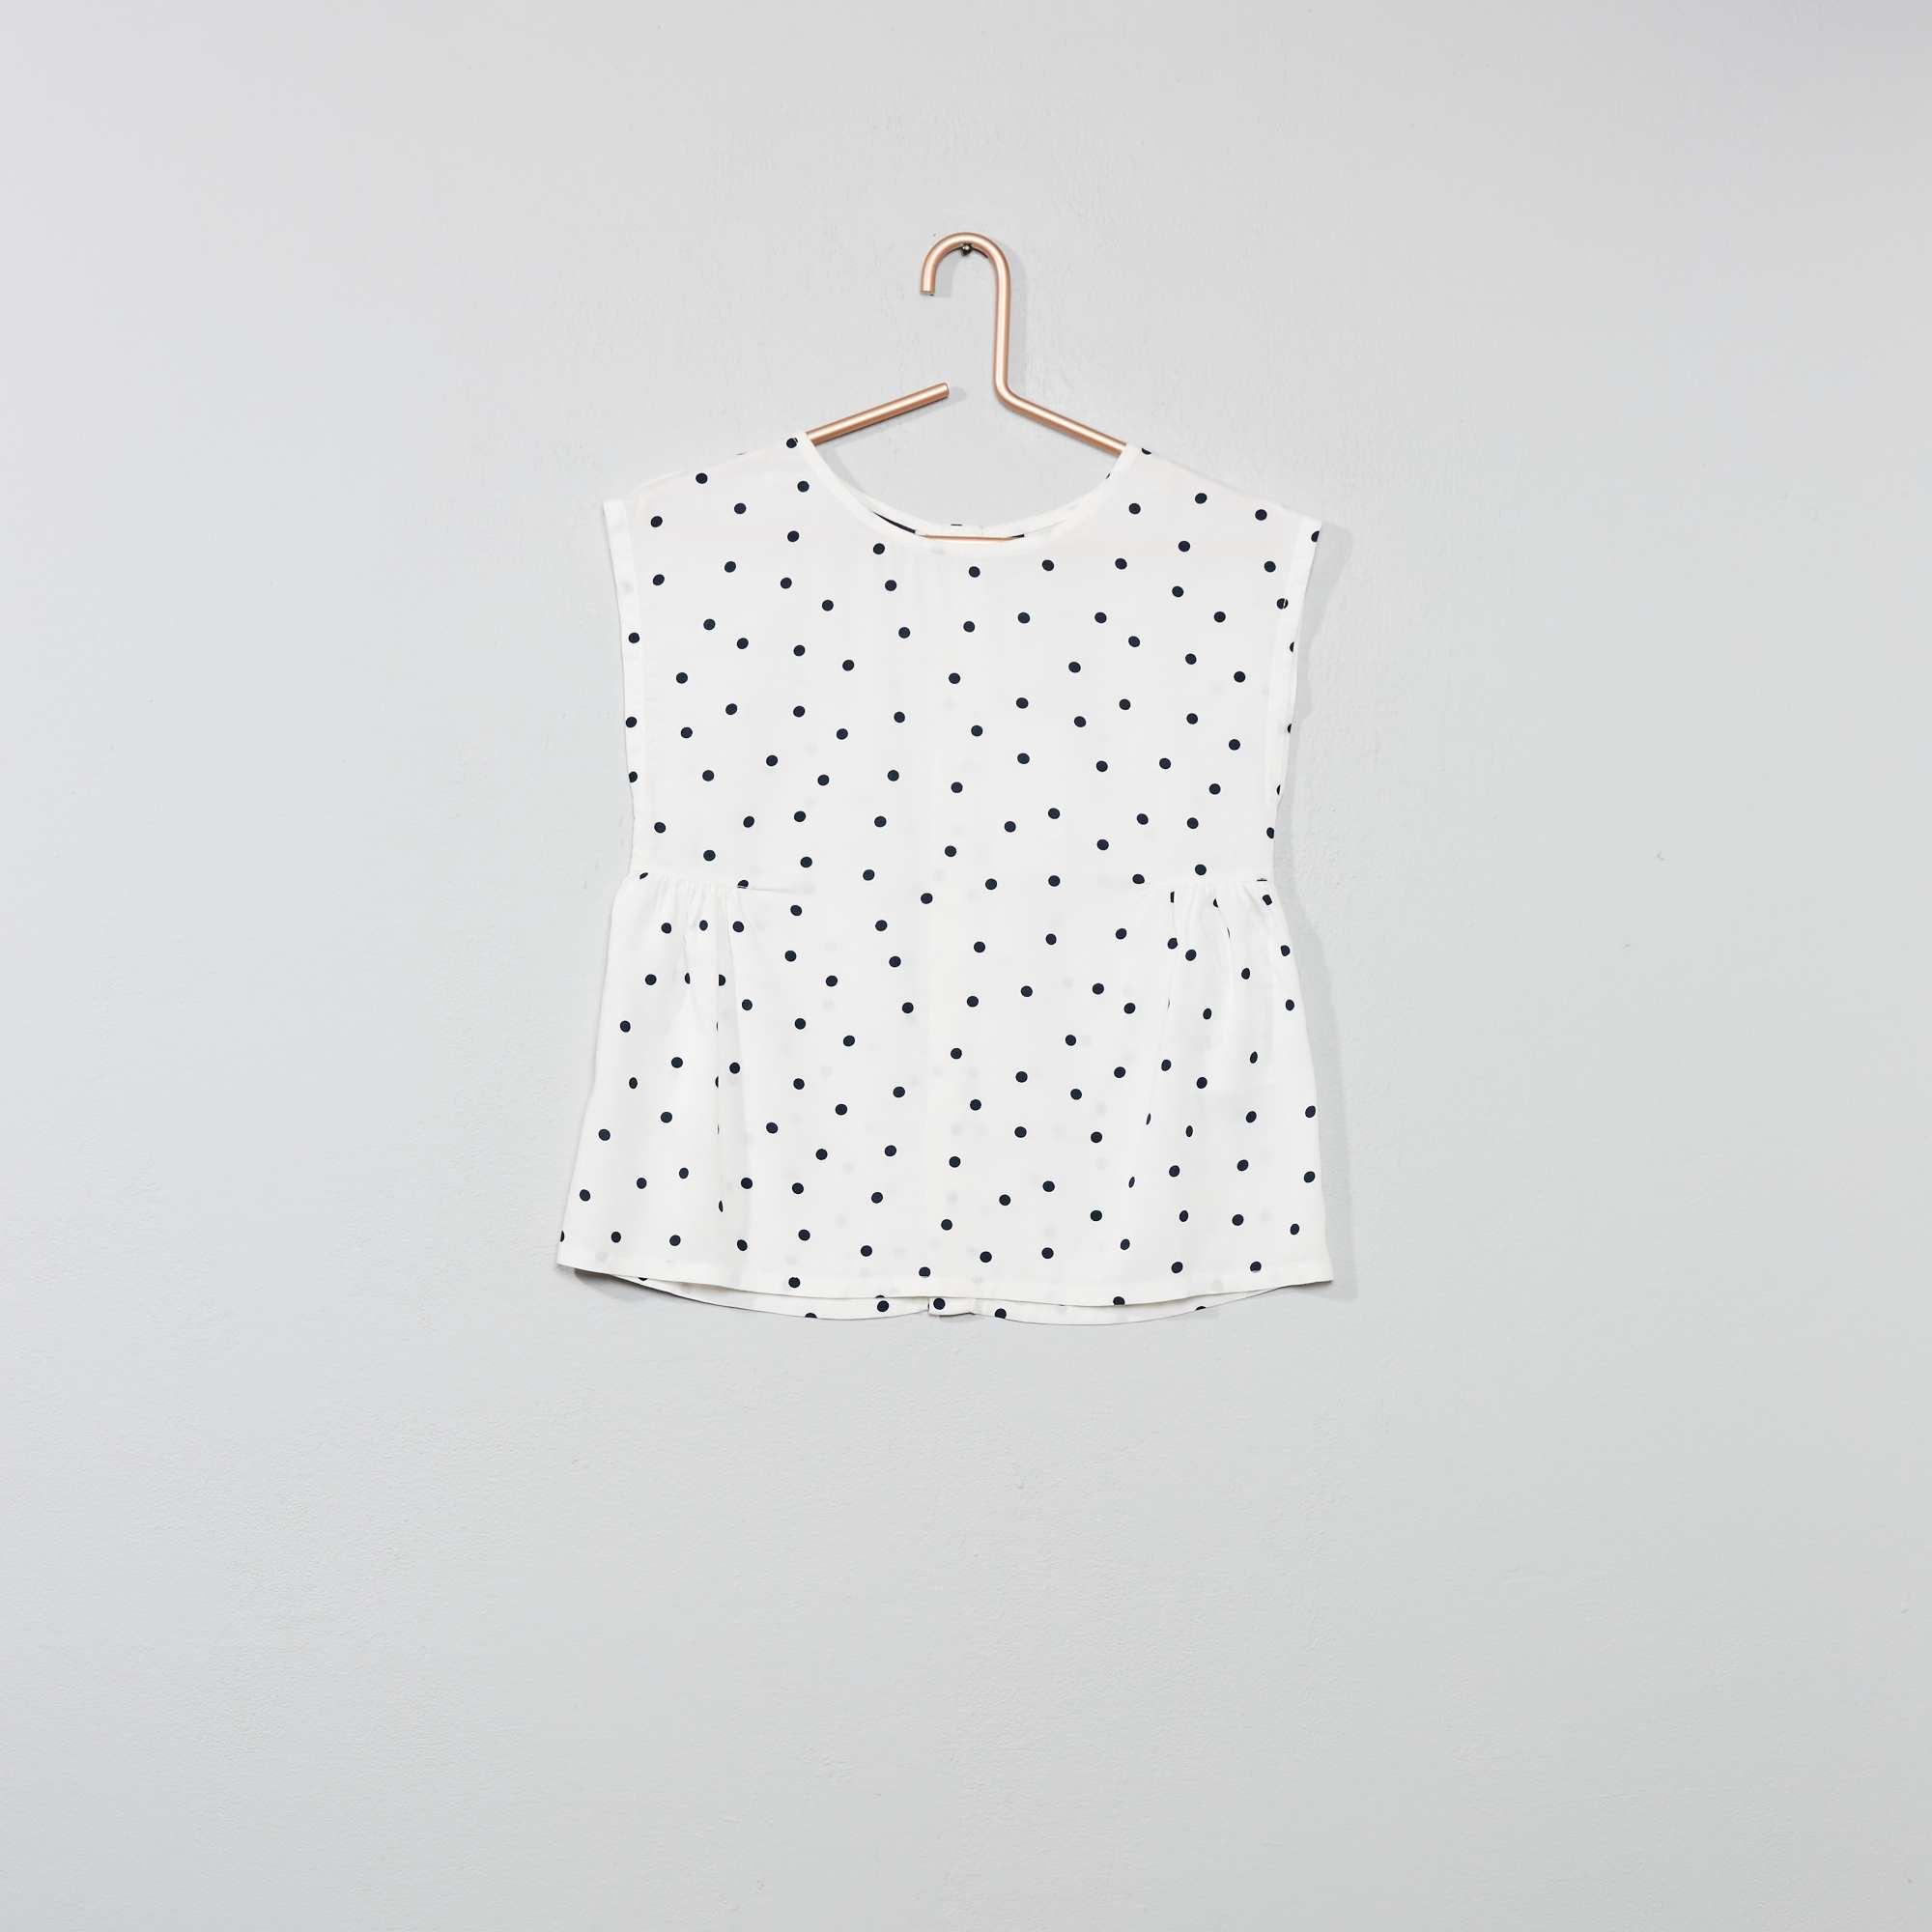 c34719f4f Blusa estampada Menina 3-12 anos - Branco - Kiabi - 7